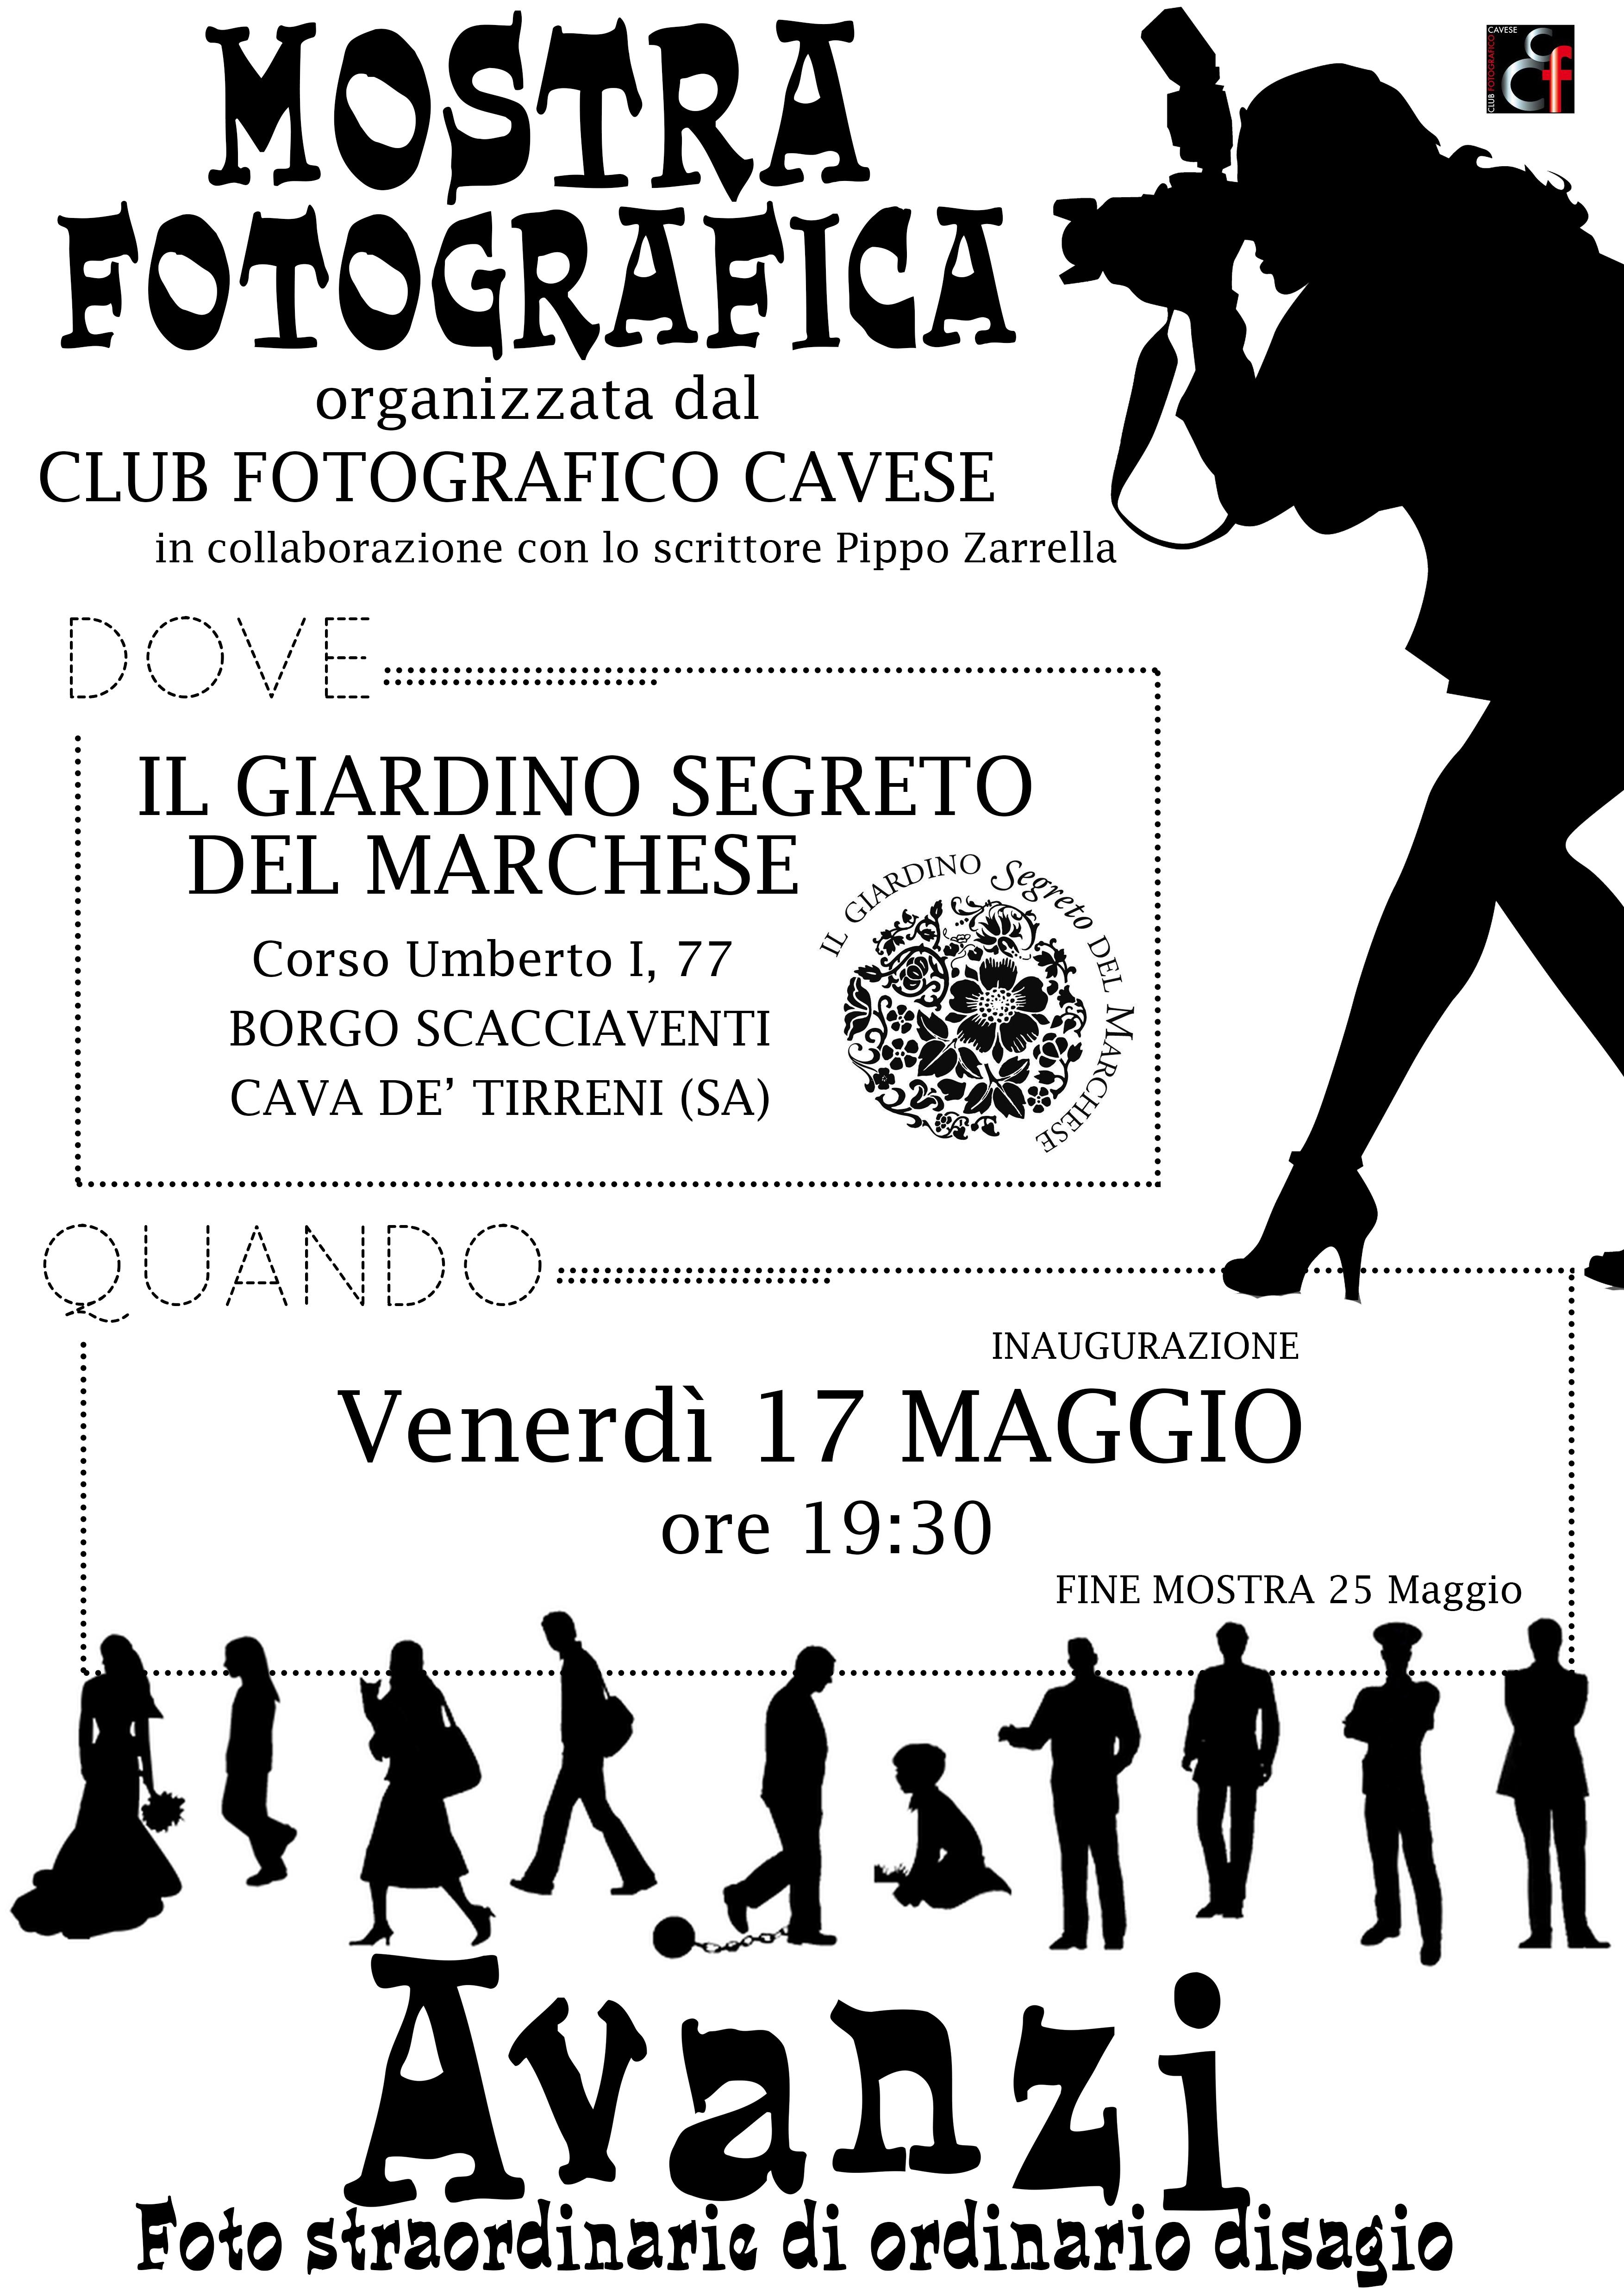 Fotografo Cava Dei Tirreni blog - club fotografico cavese